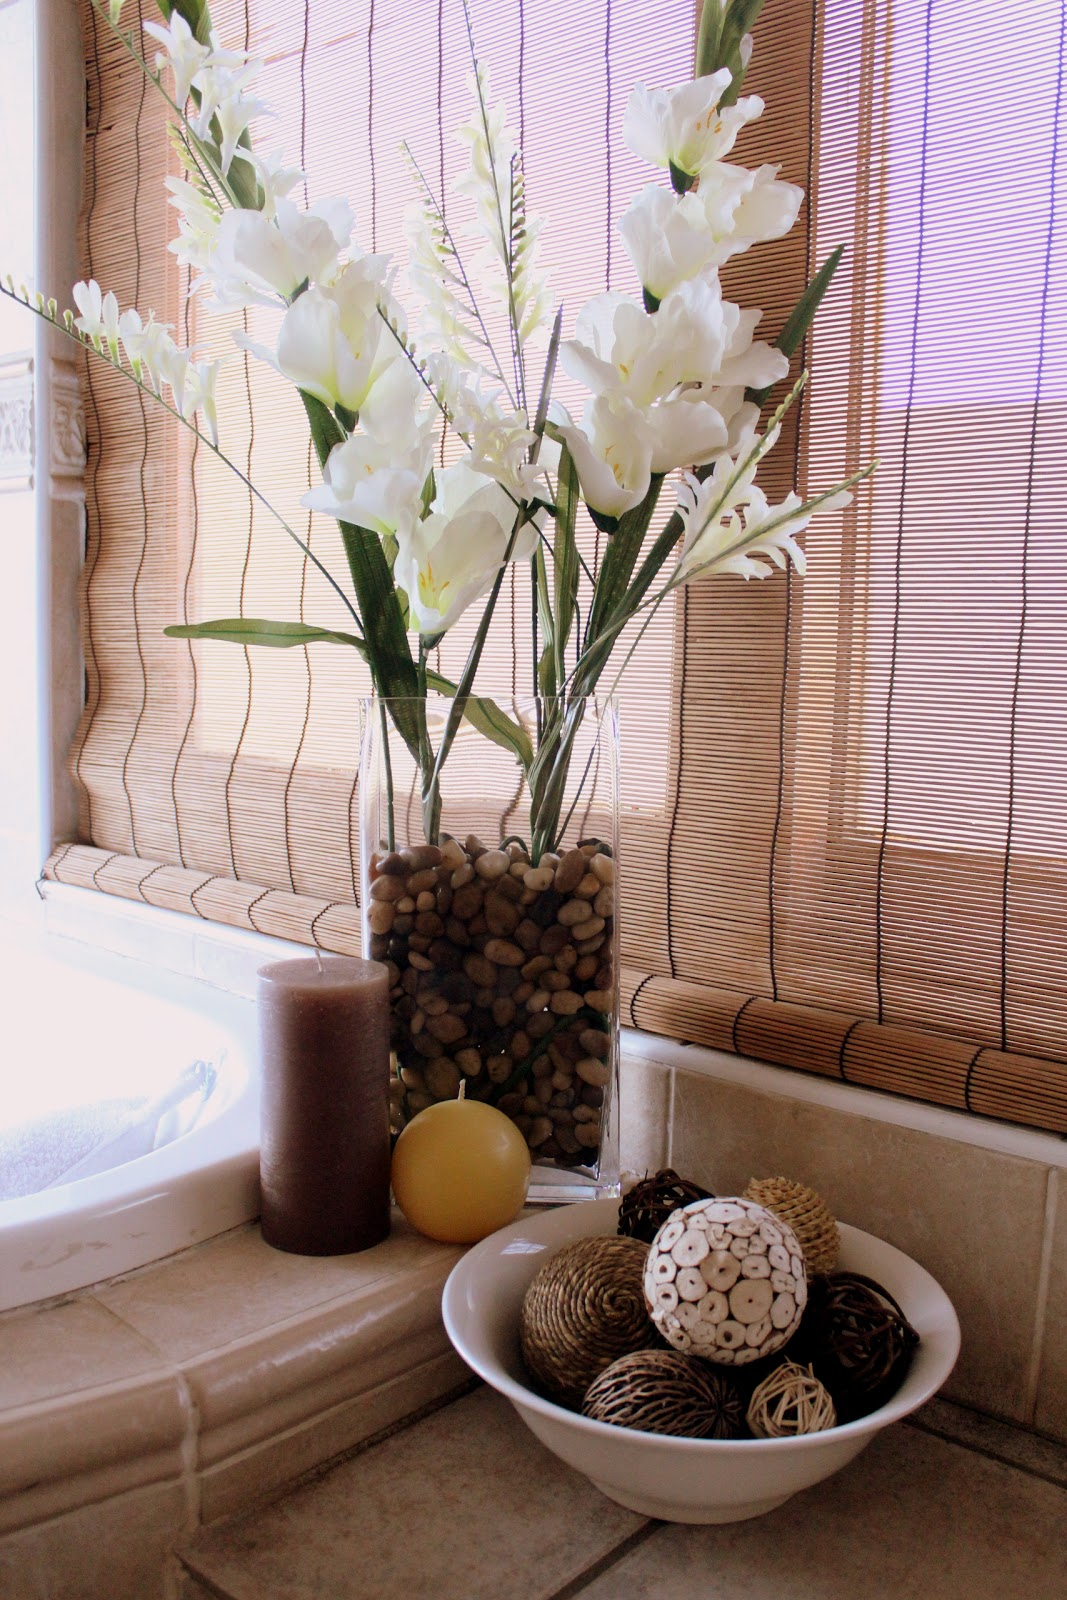 Everyday jessica spa master bathroom for Bathroom ideas spa themed